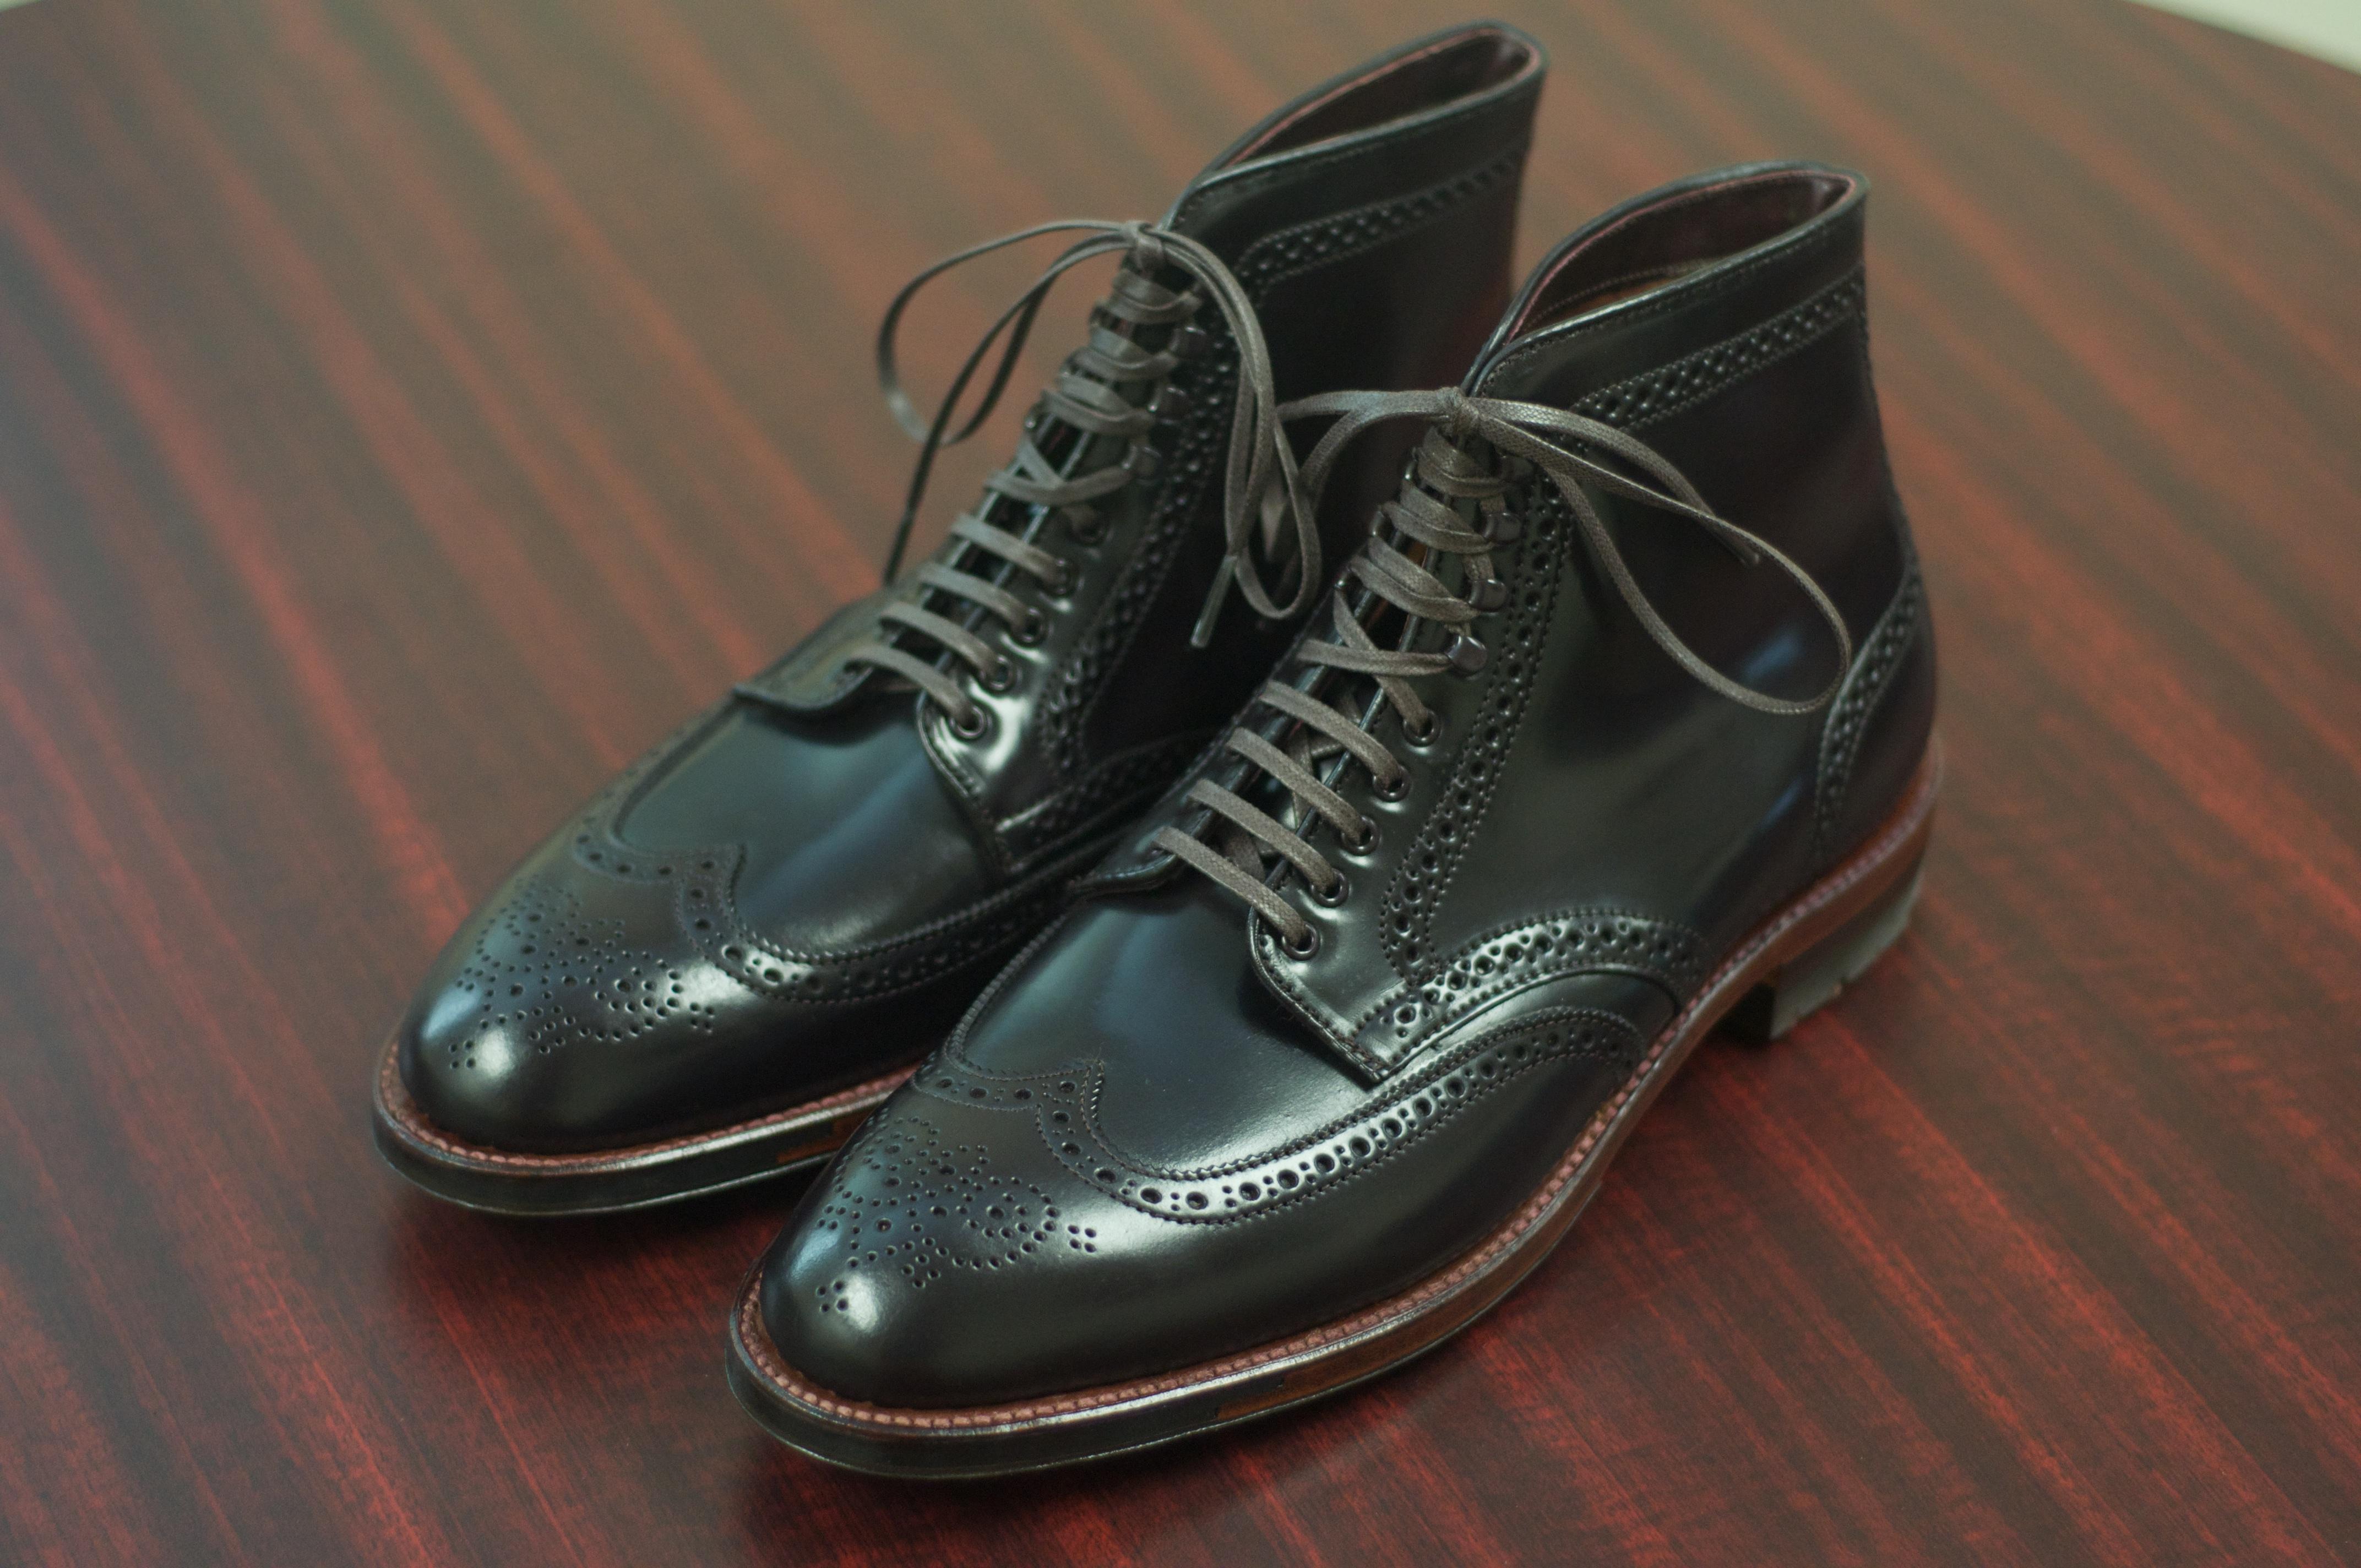 Alden Color 8 Grant Wingtip Boots Alden Of San Diego